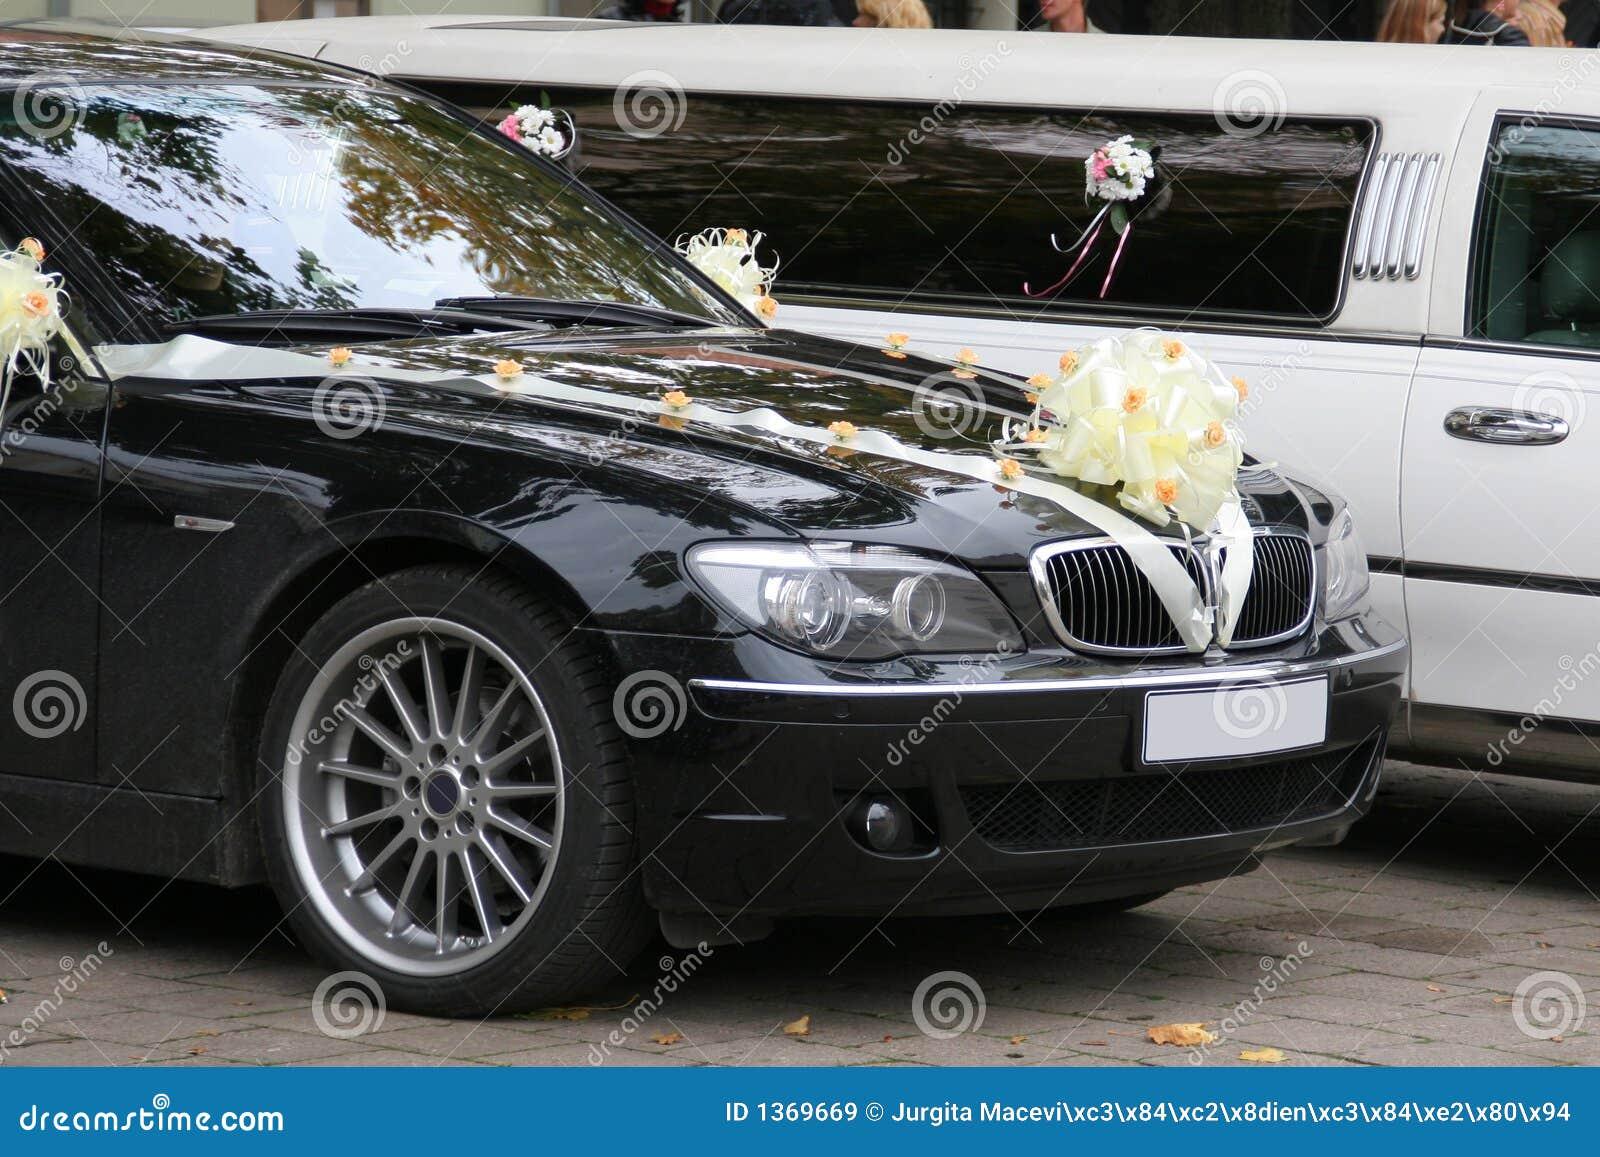 Decorated Wedding Cars Stock Image Image Of Bouquet Decoration